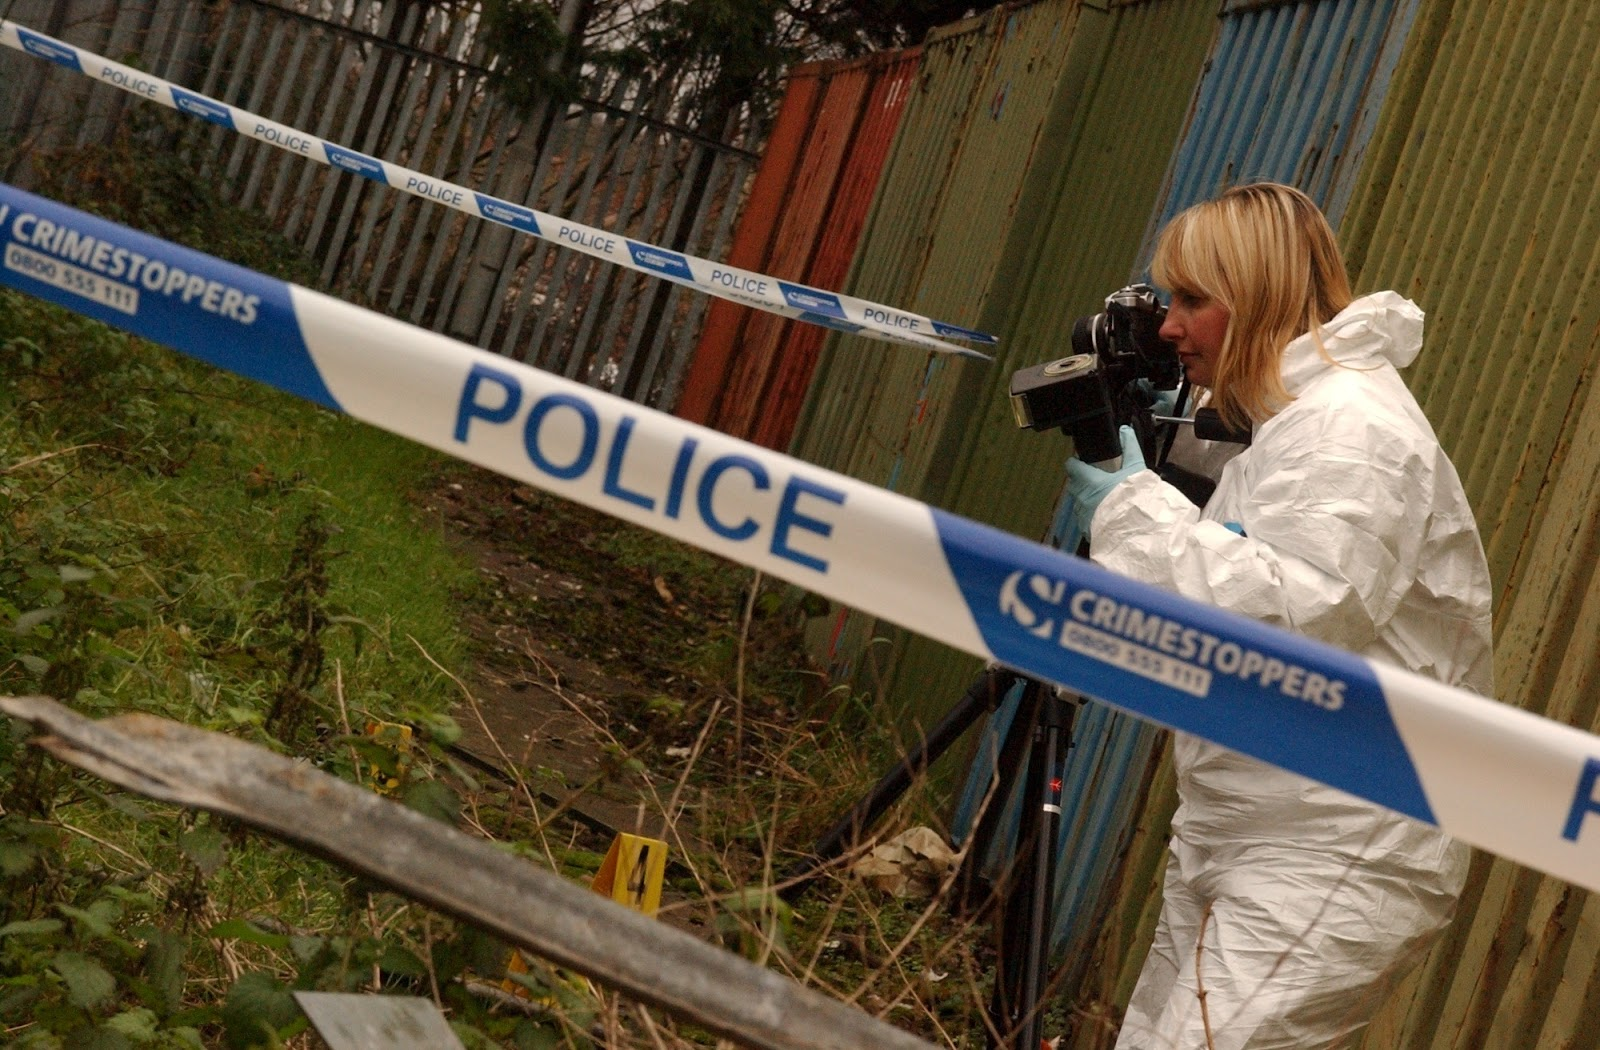 hutton criminal profiling associates the relationships between the relationships between fear and precautions